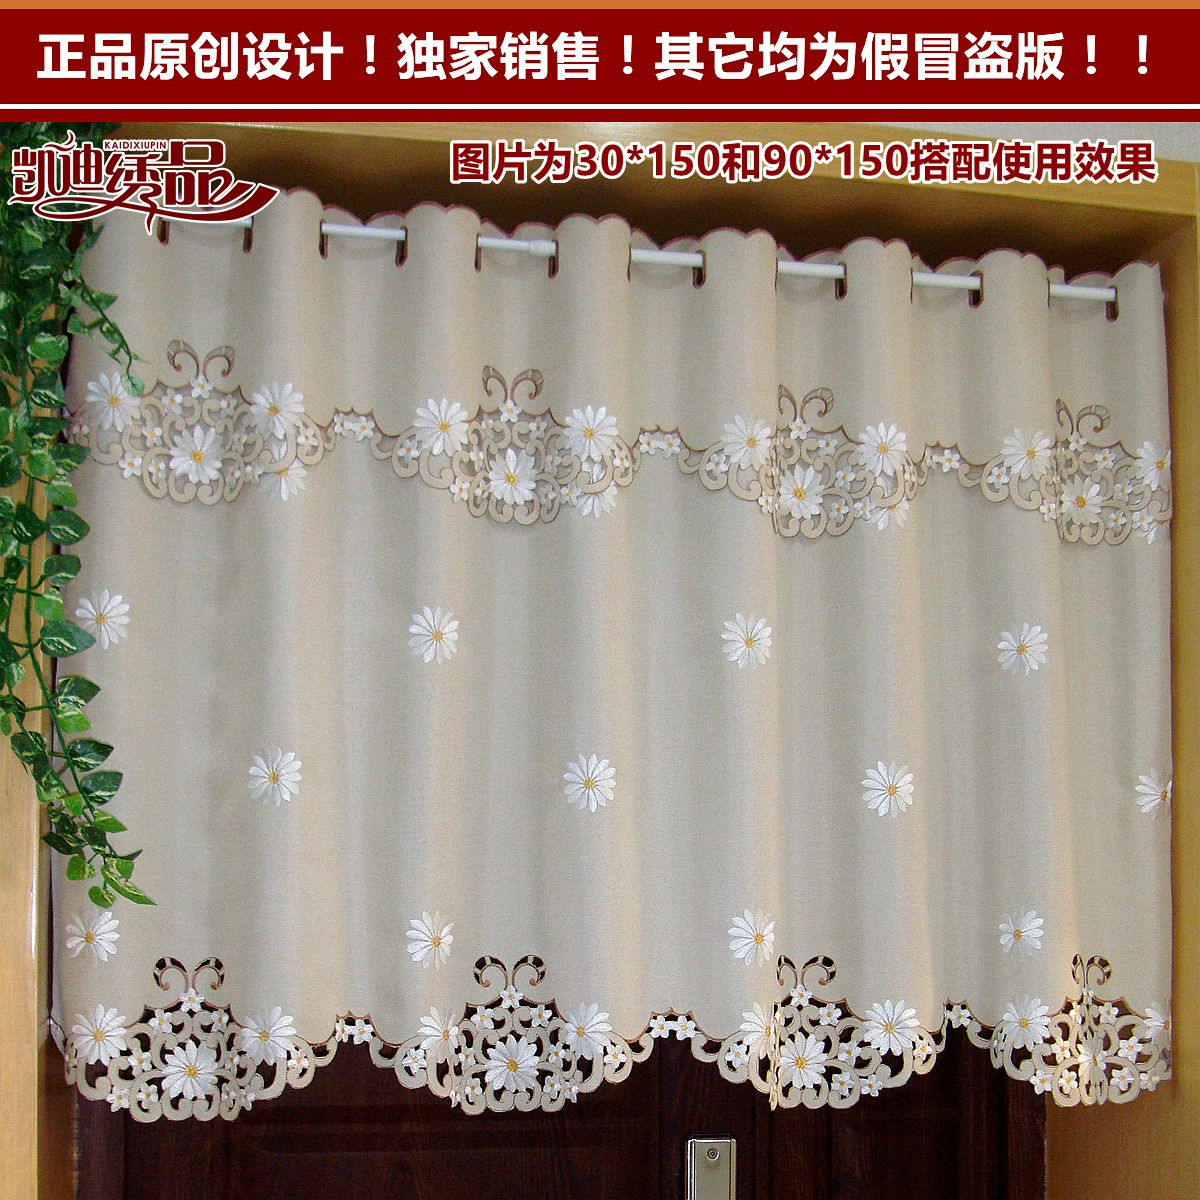 Foreign Trade Pipe Curtain Curtain Curtain Half Curtain